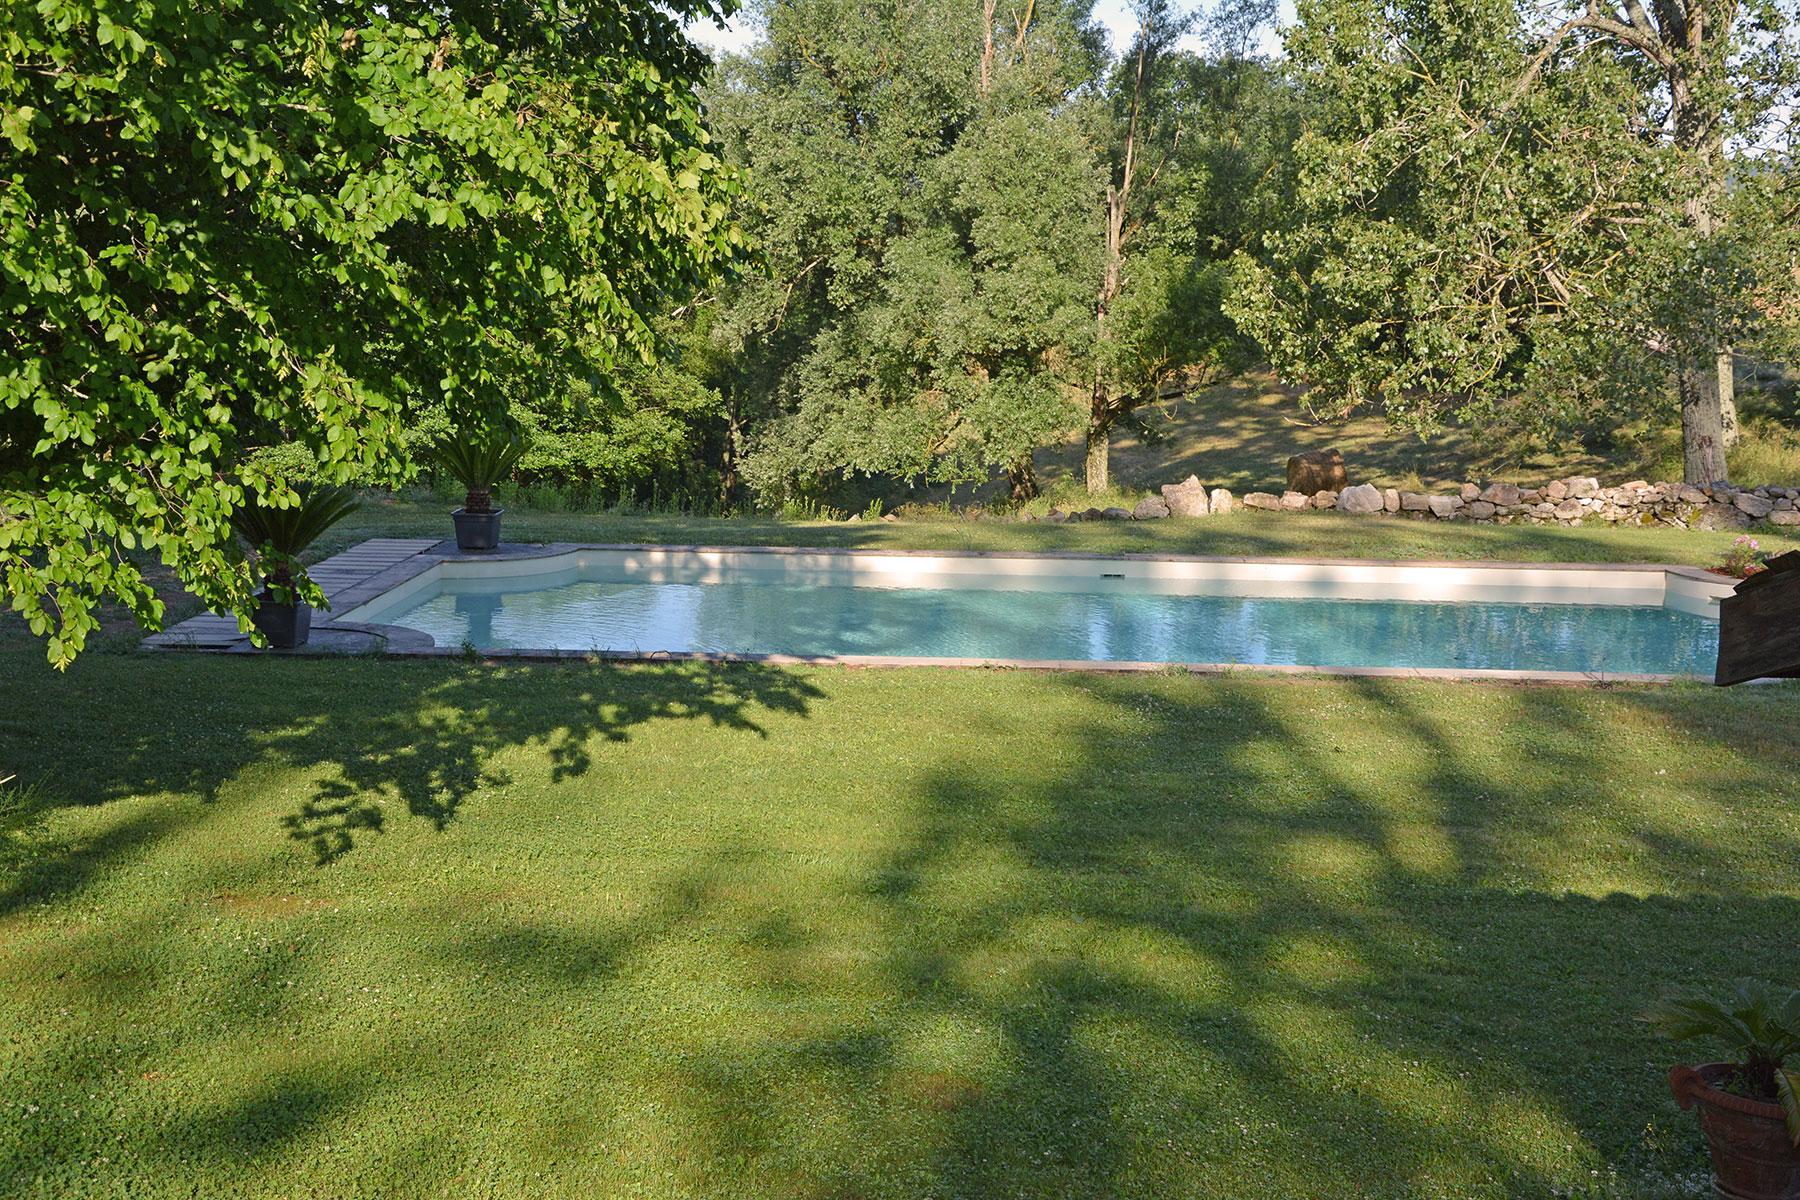 Maison d hotes ardeche luxe ventana blog - Chambres d hotes ardeche avec piscine ...